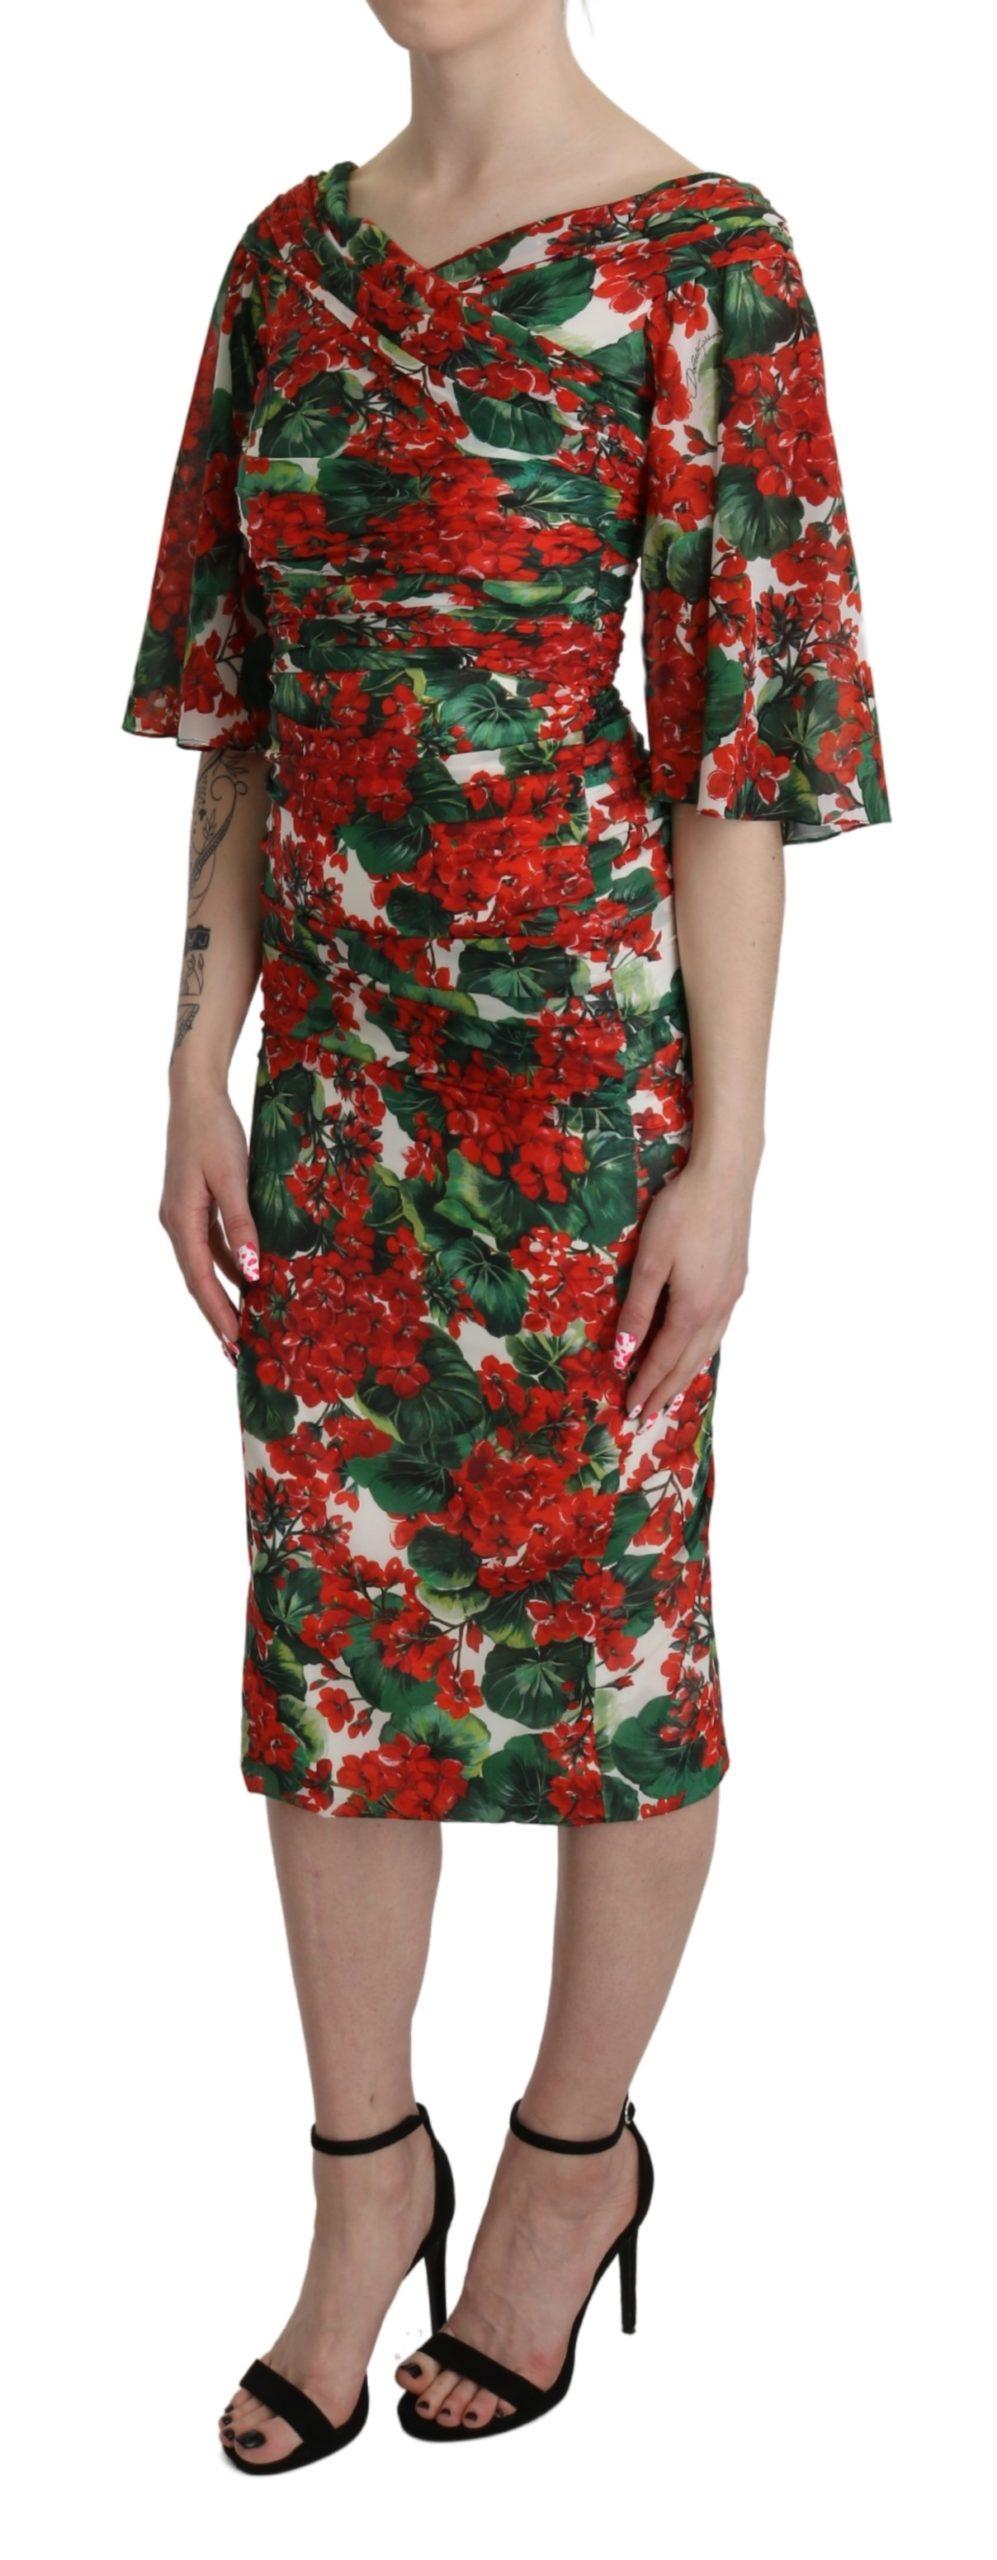 Dolce & Gabbana Women's Floral Midi Silk Dress Multicolor DR2617 - IT38 XS